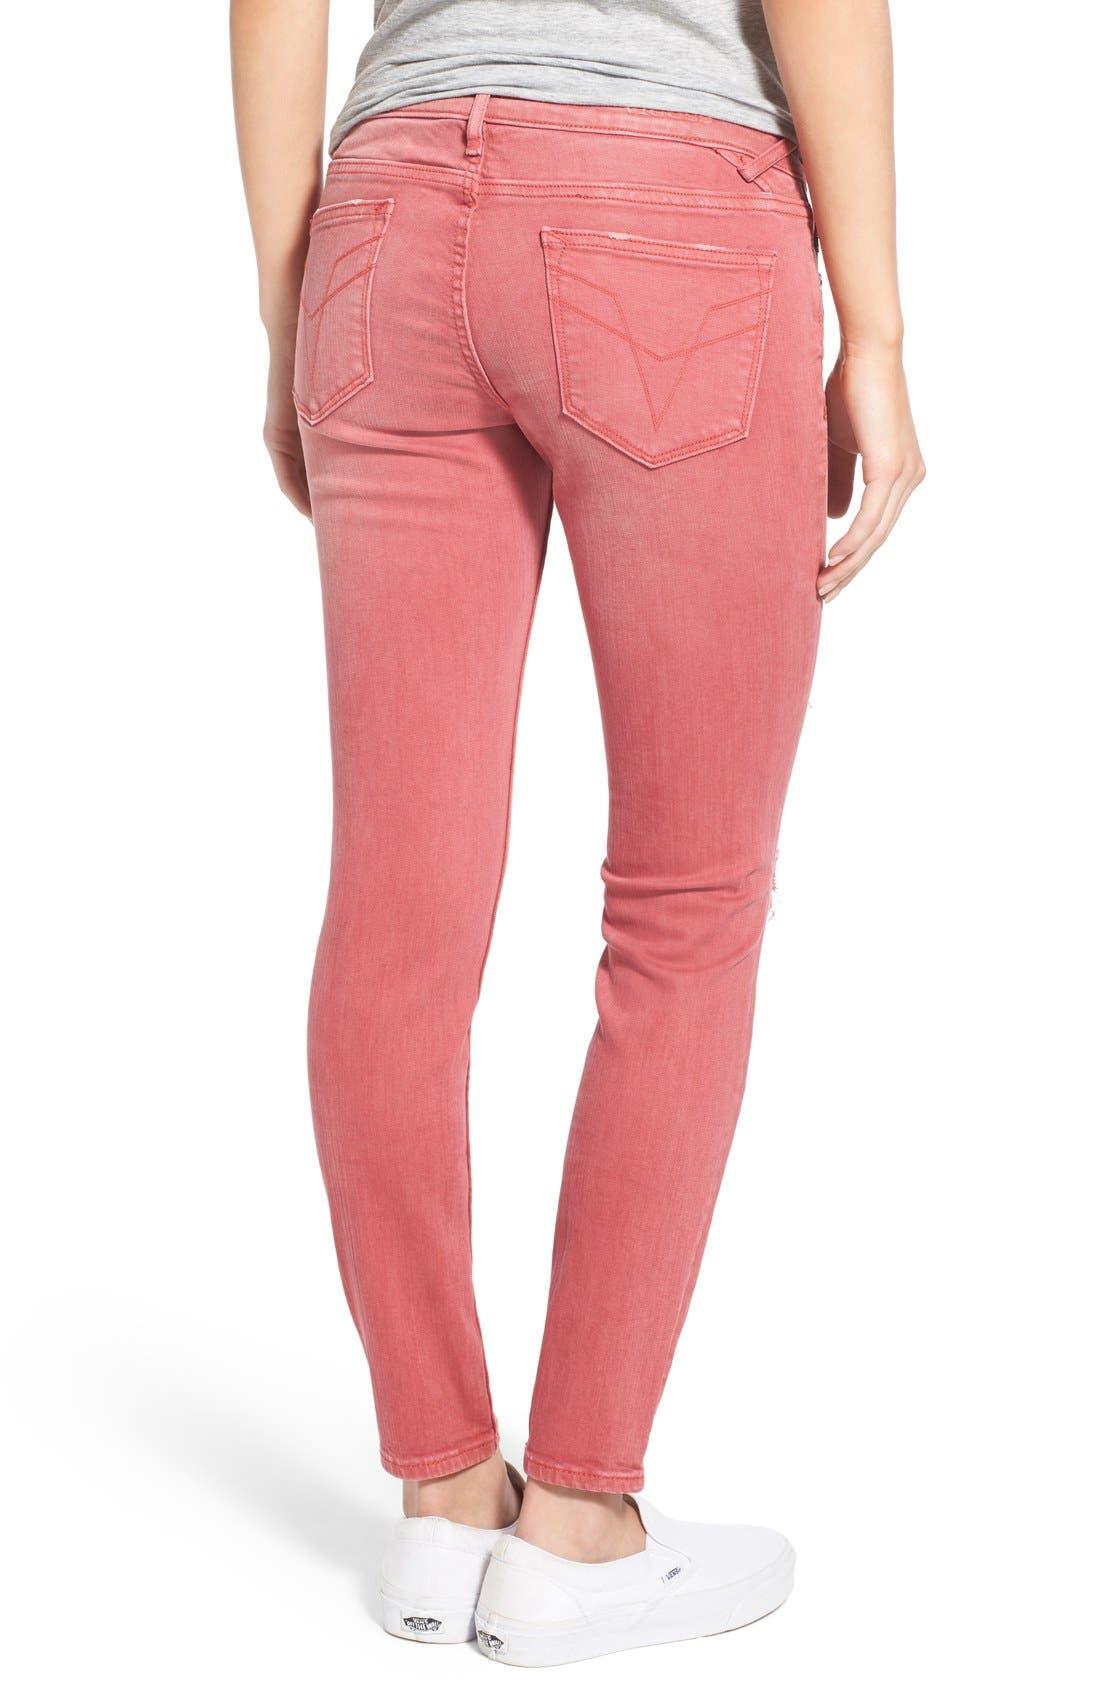 Alternate Image 2  - Vigoss 'Chelsea' Distressed Skinny Jeans